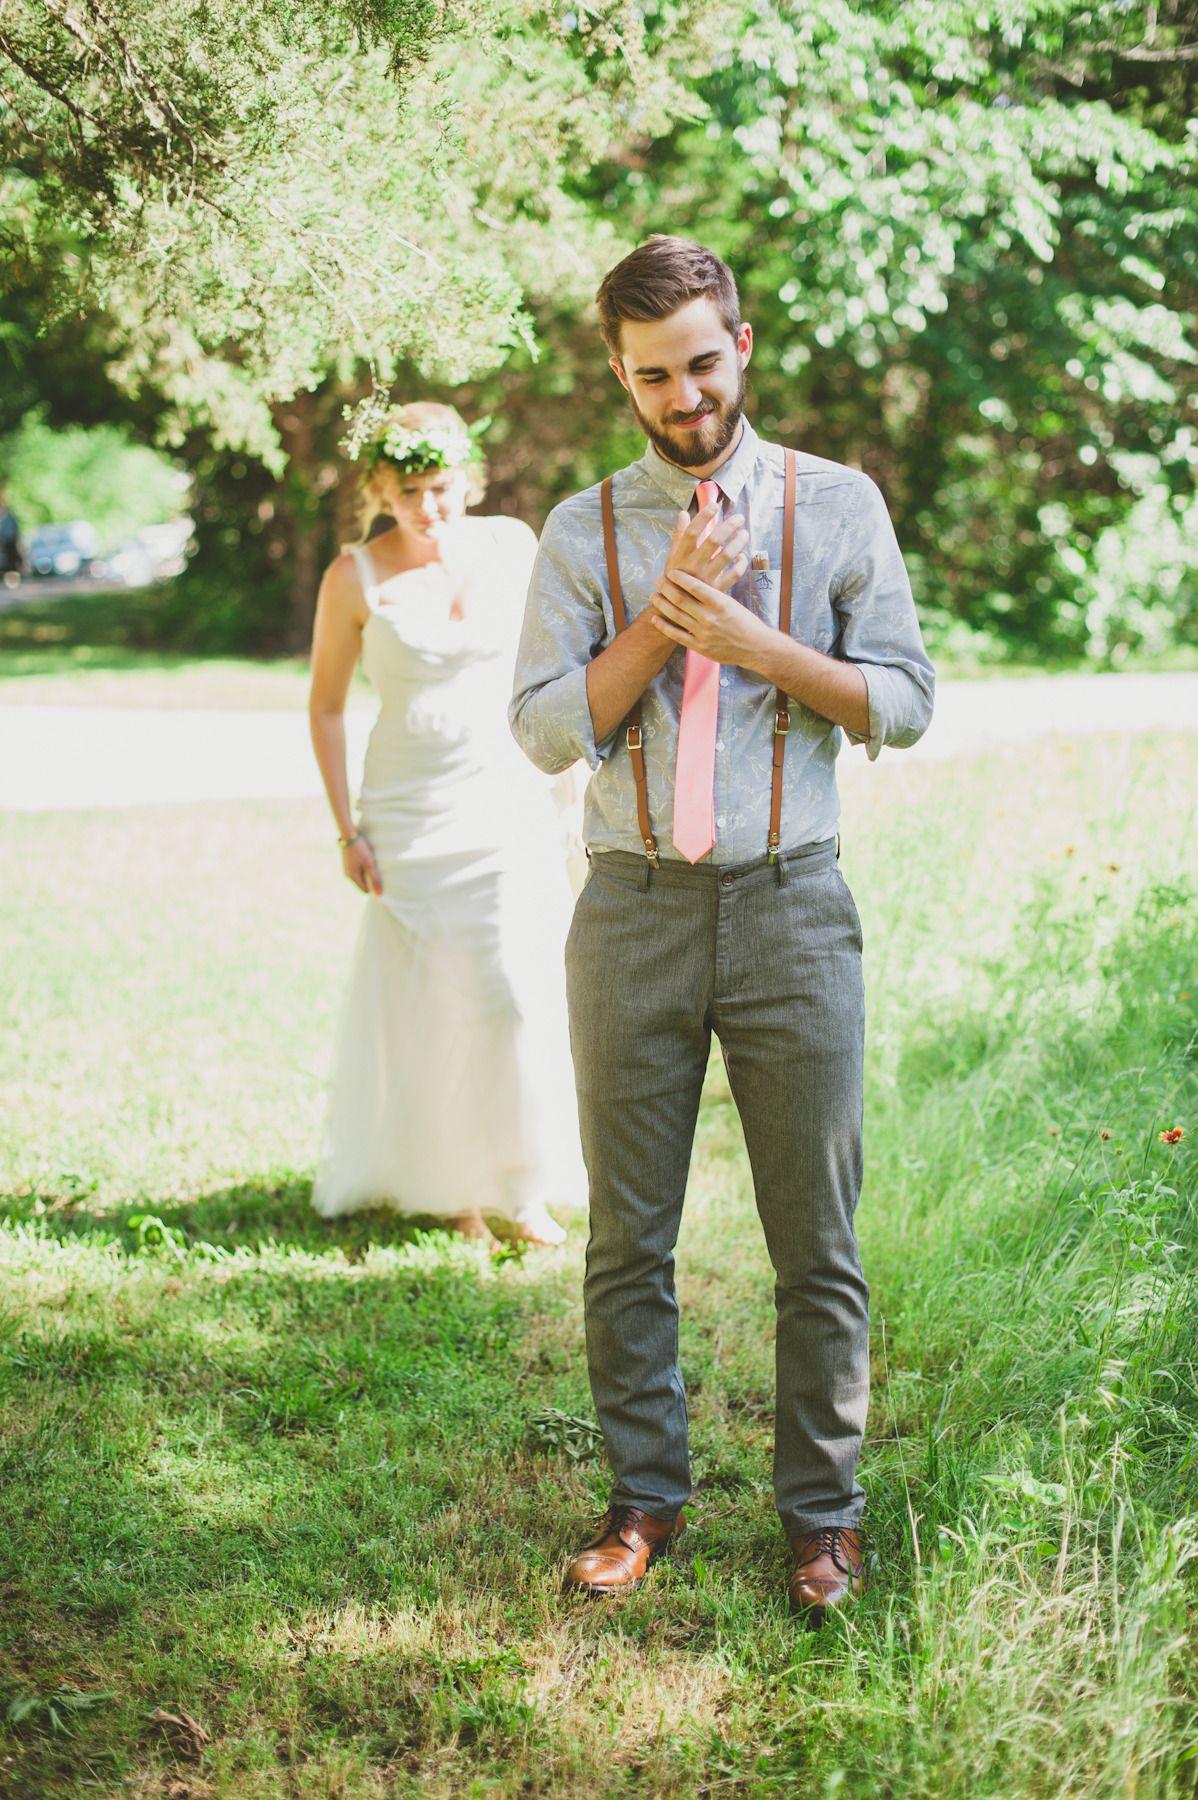 Earthy summer backyard wedding anxious earthy and backyard